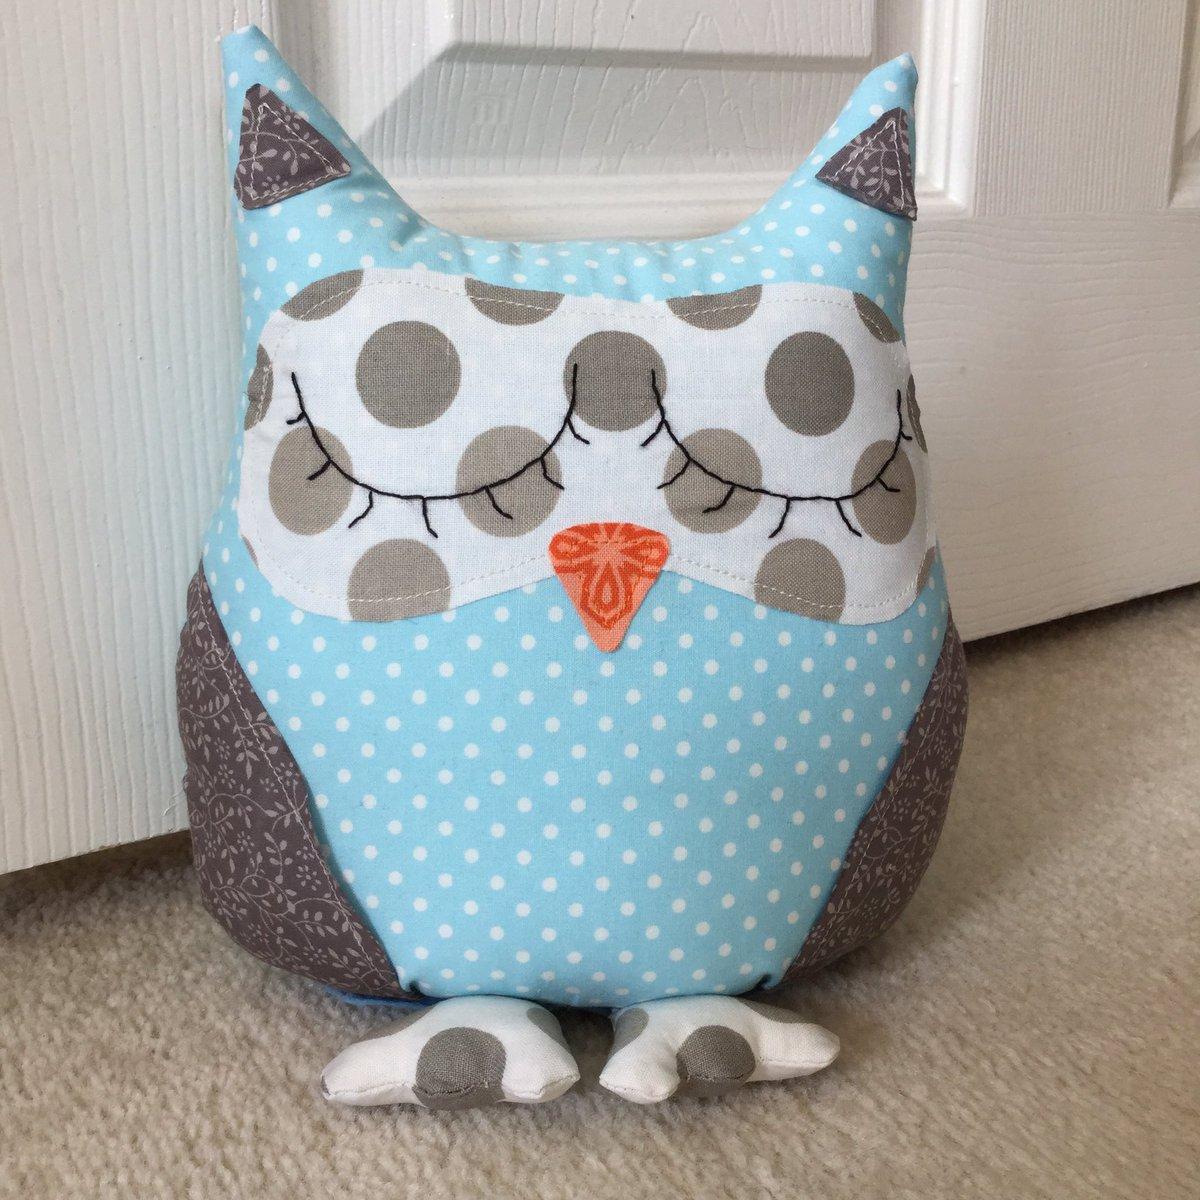 Why not try making your own owl doorstop?  http:// aboxofbuttons.wordpress.com/2017/08/02/fab ric-polka-dot-owl-doorstop/ &nbsp; …  #crafthour #diy #sewing #aboxofbuttons #owl #doorstop #craft #sew #blog<br>http://pic.twitter.com/q3e3ibCcwX